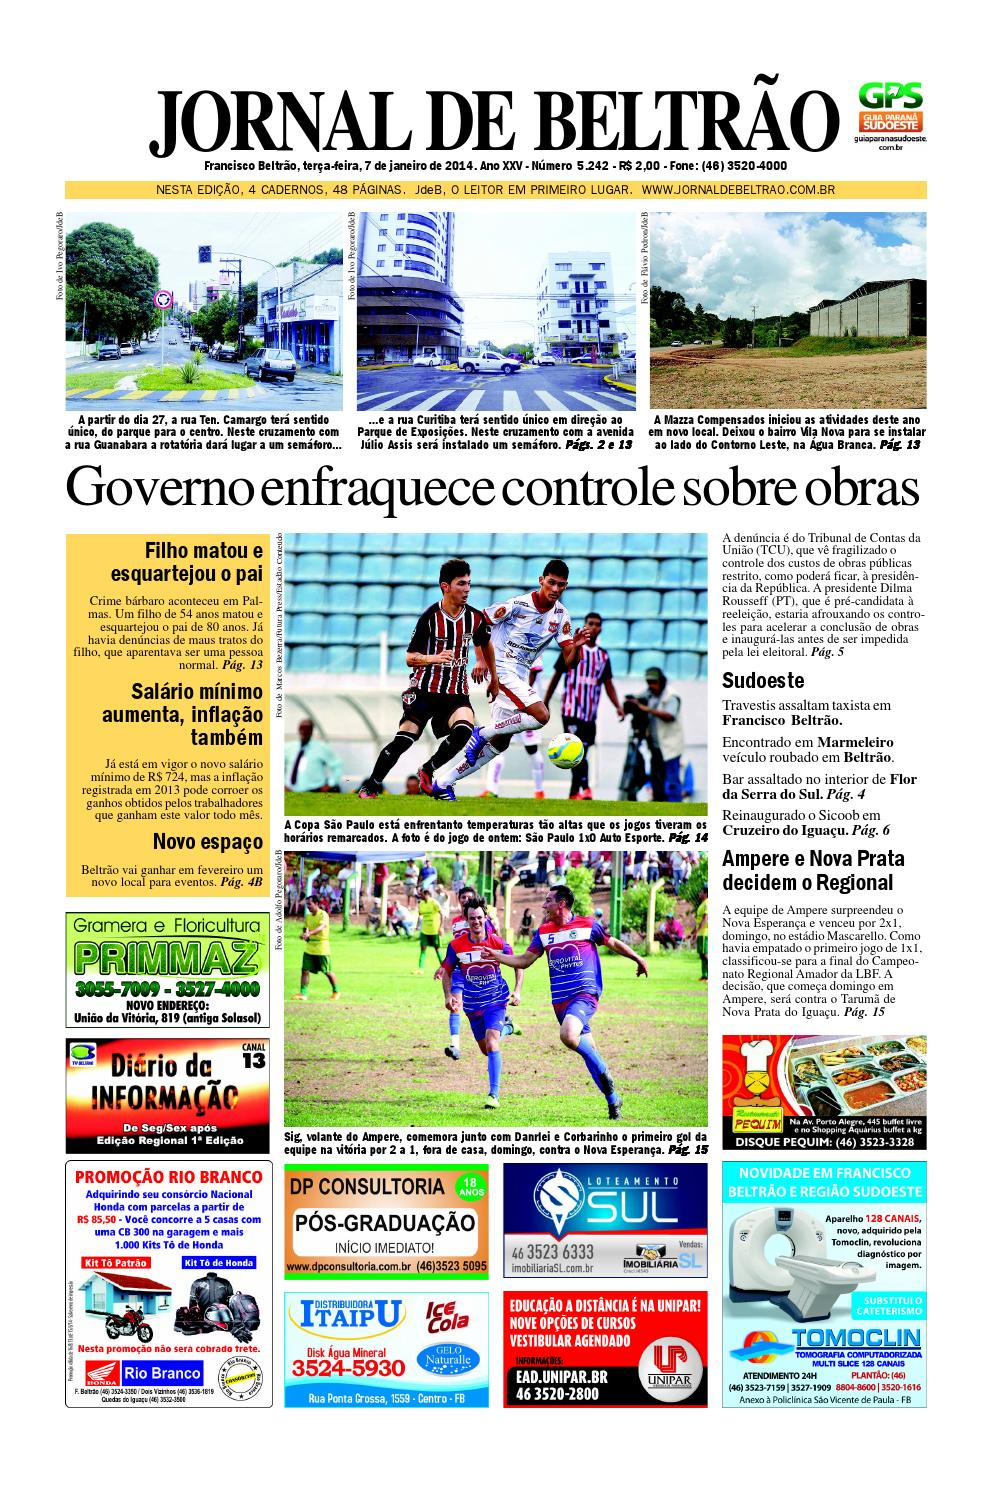 Jornaldebeltrao 5242 07-01-2014.pdf by Orangotoe - issuu cca56ac1d7888